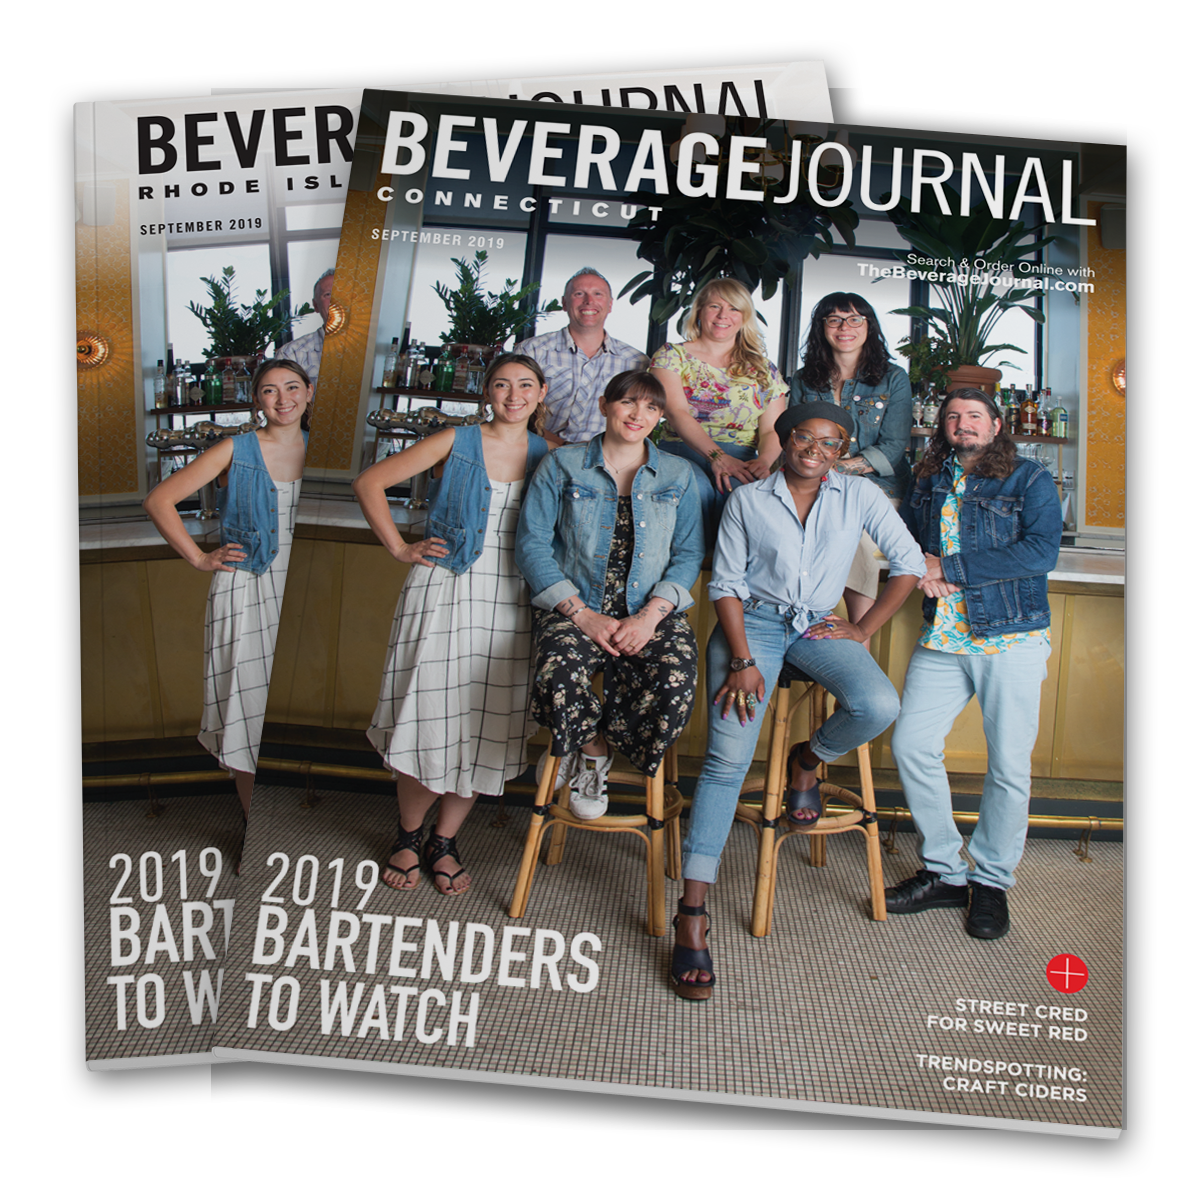 HOMEPAGE | The Beverage Journal